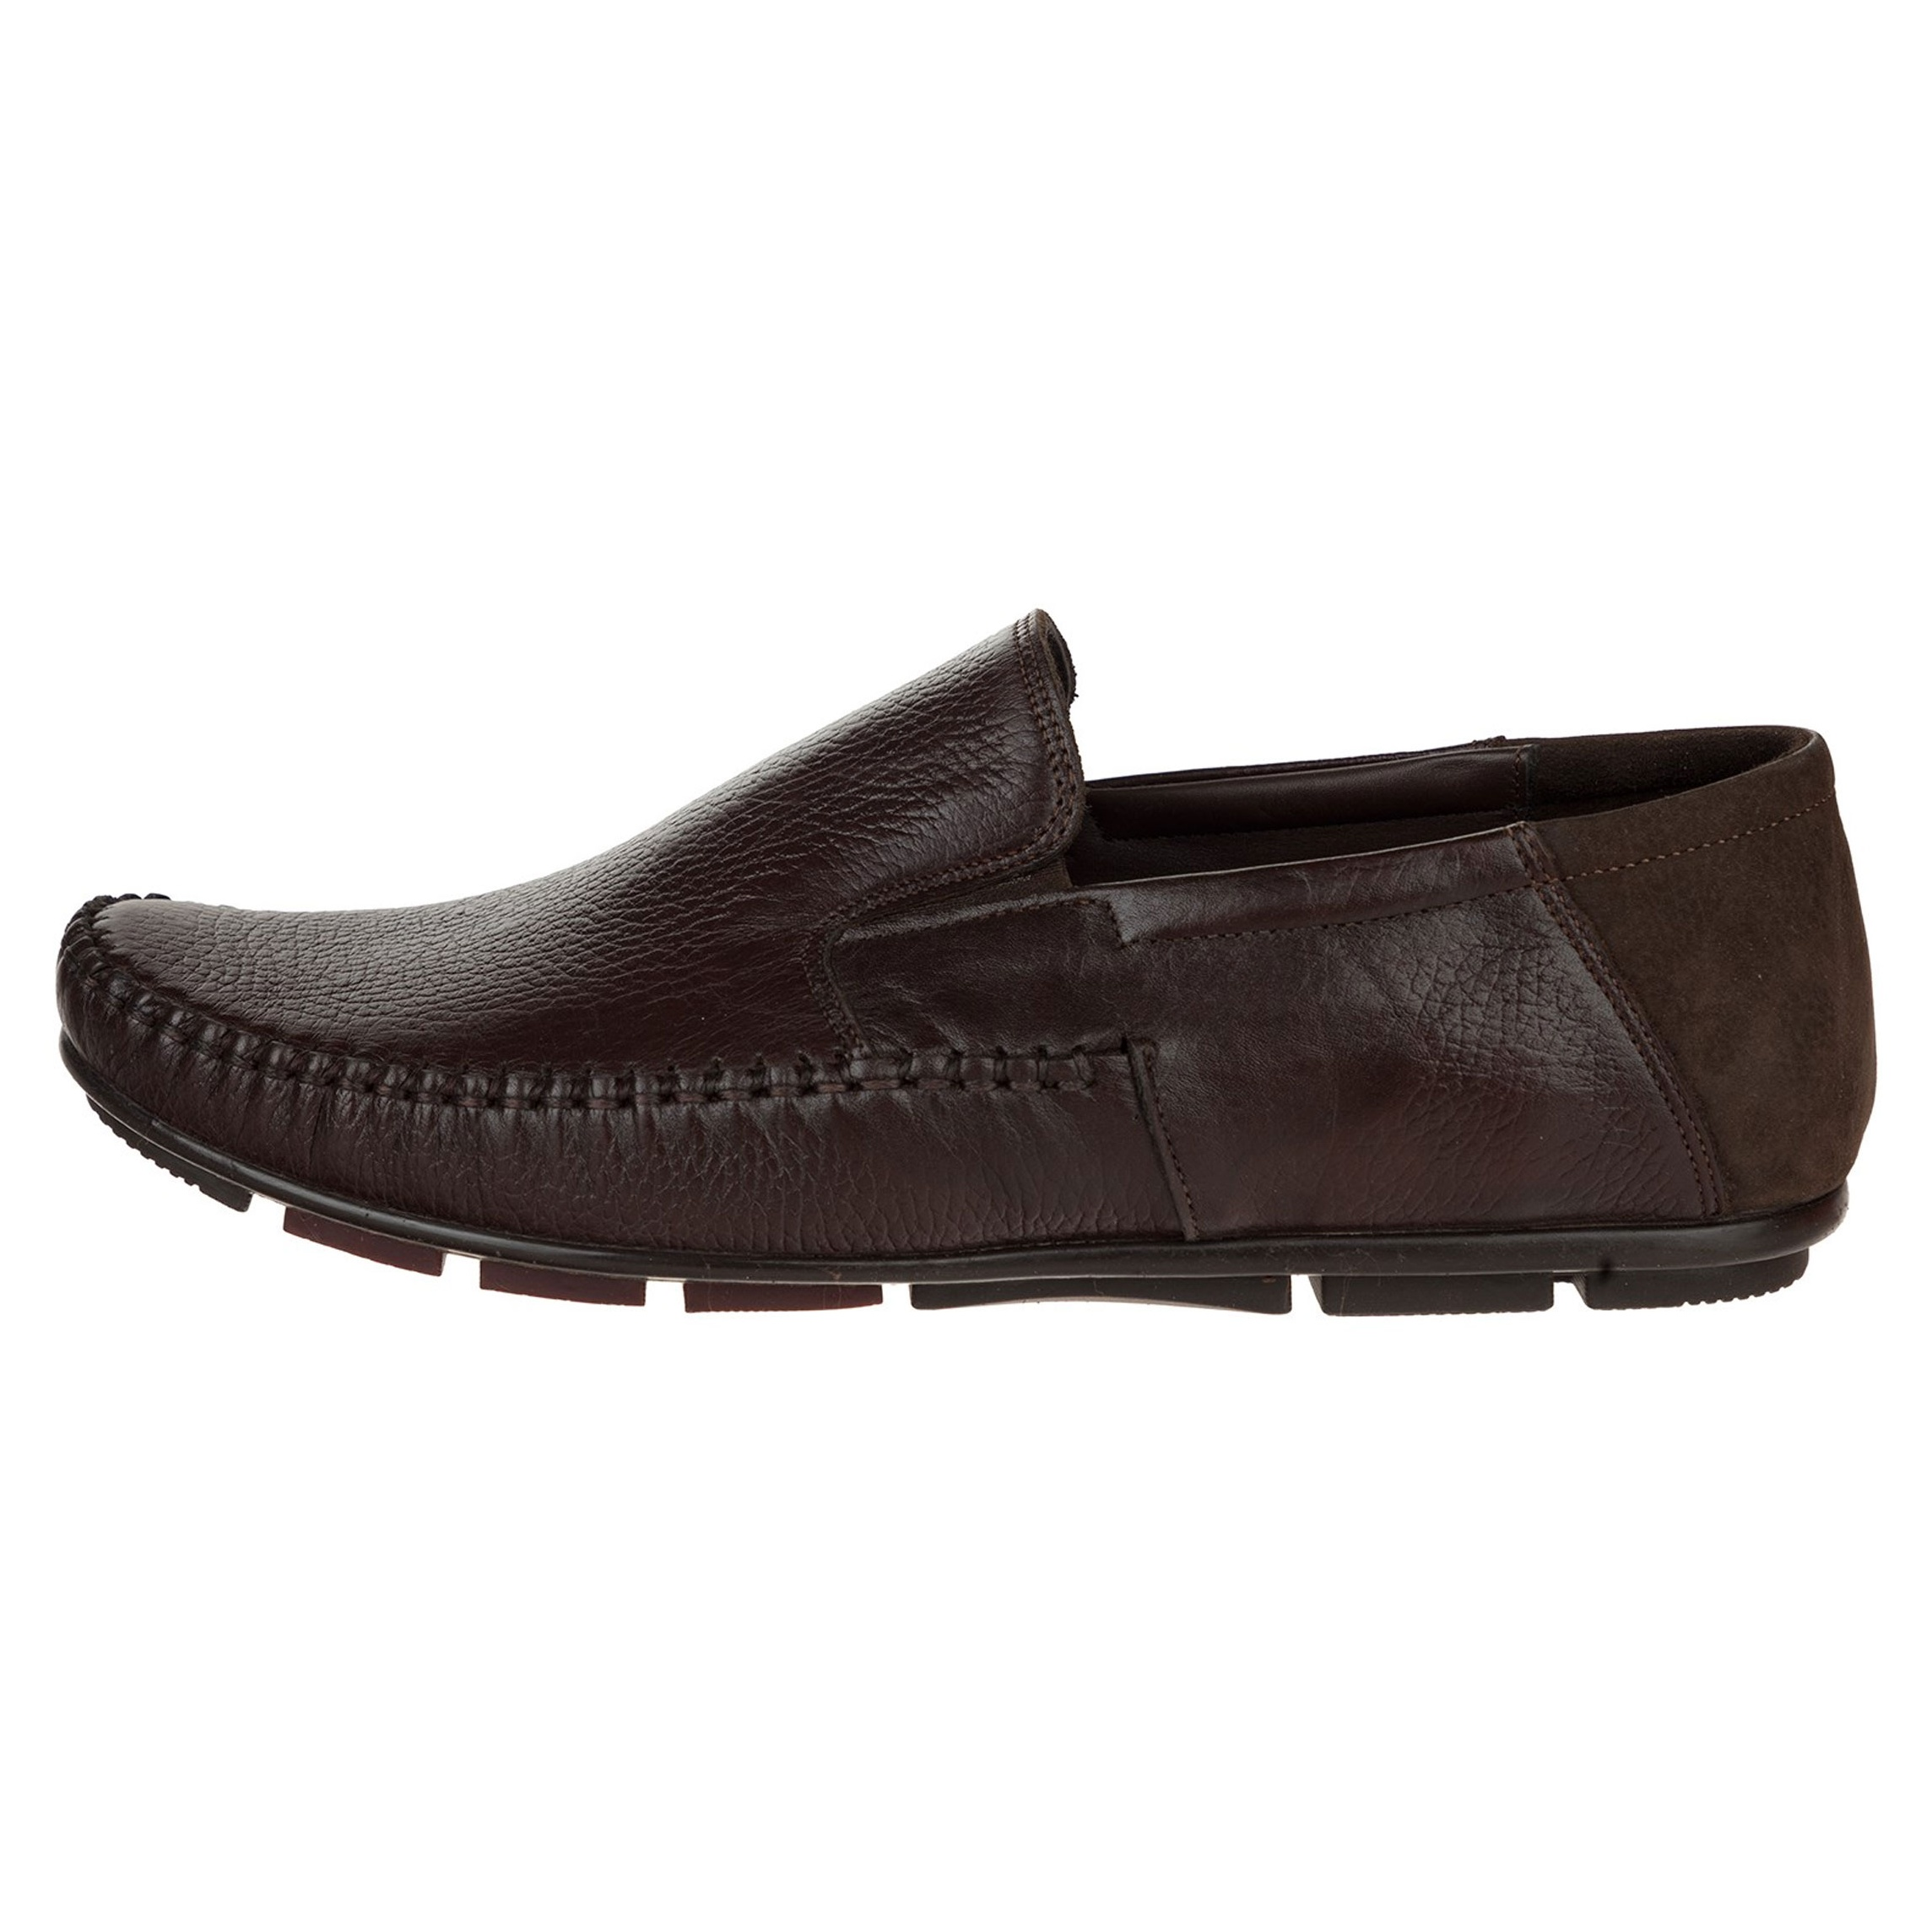 کفش راحتی چرم مردانه - شیفر